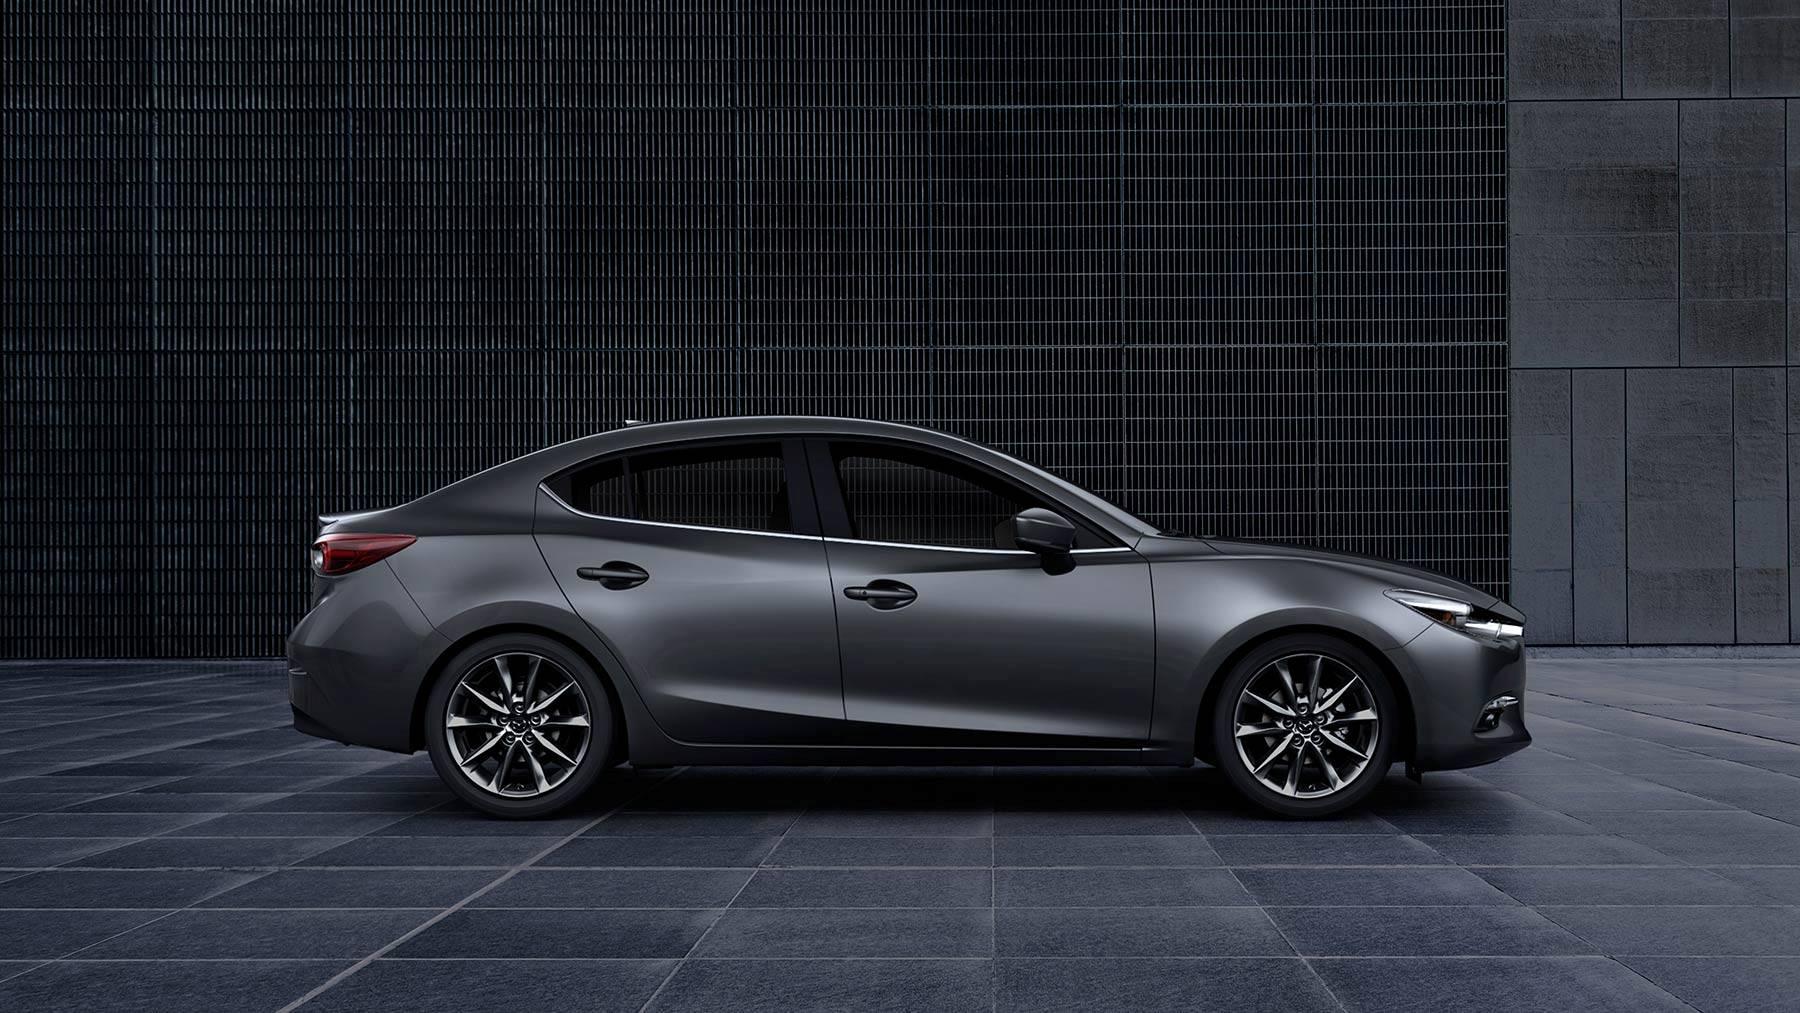 2018 Mazda3 for Sale near Davis, CA